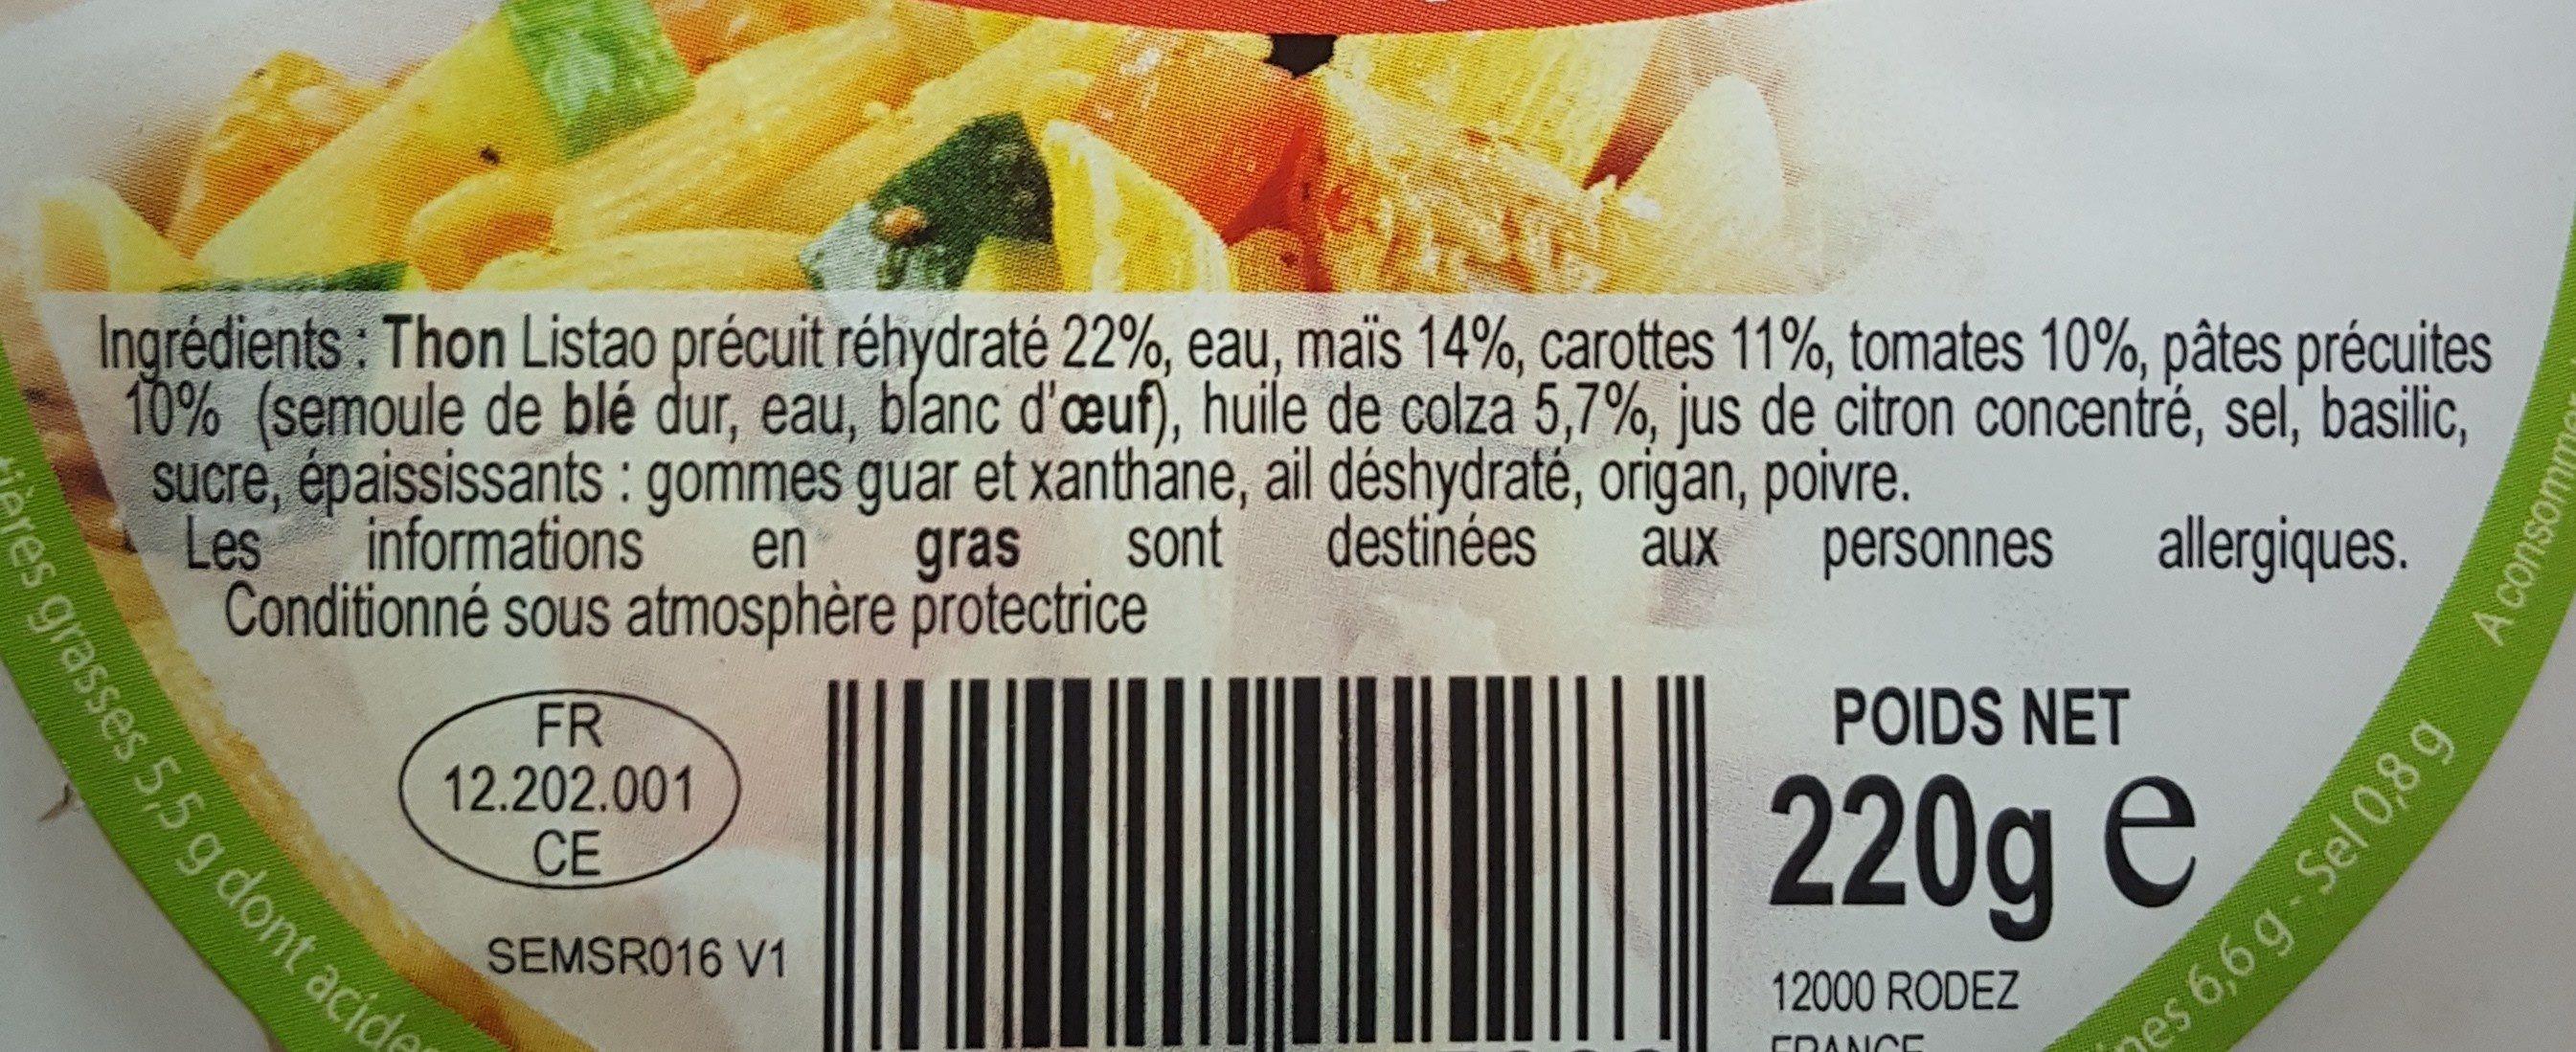 Salade italienne - Ingrédients - fr